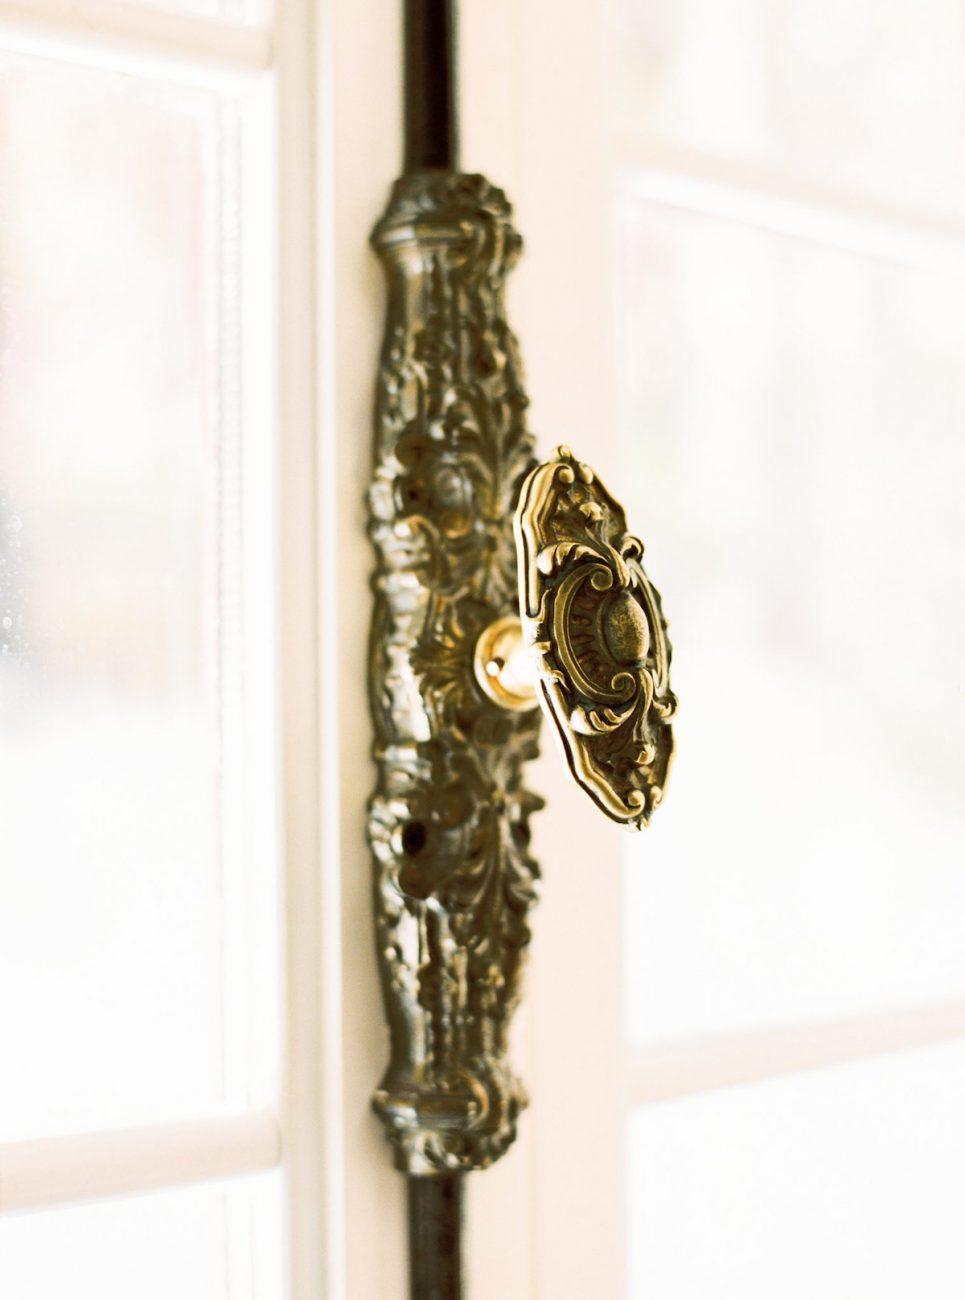 Palace Wedding Inspiration - antique door knob